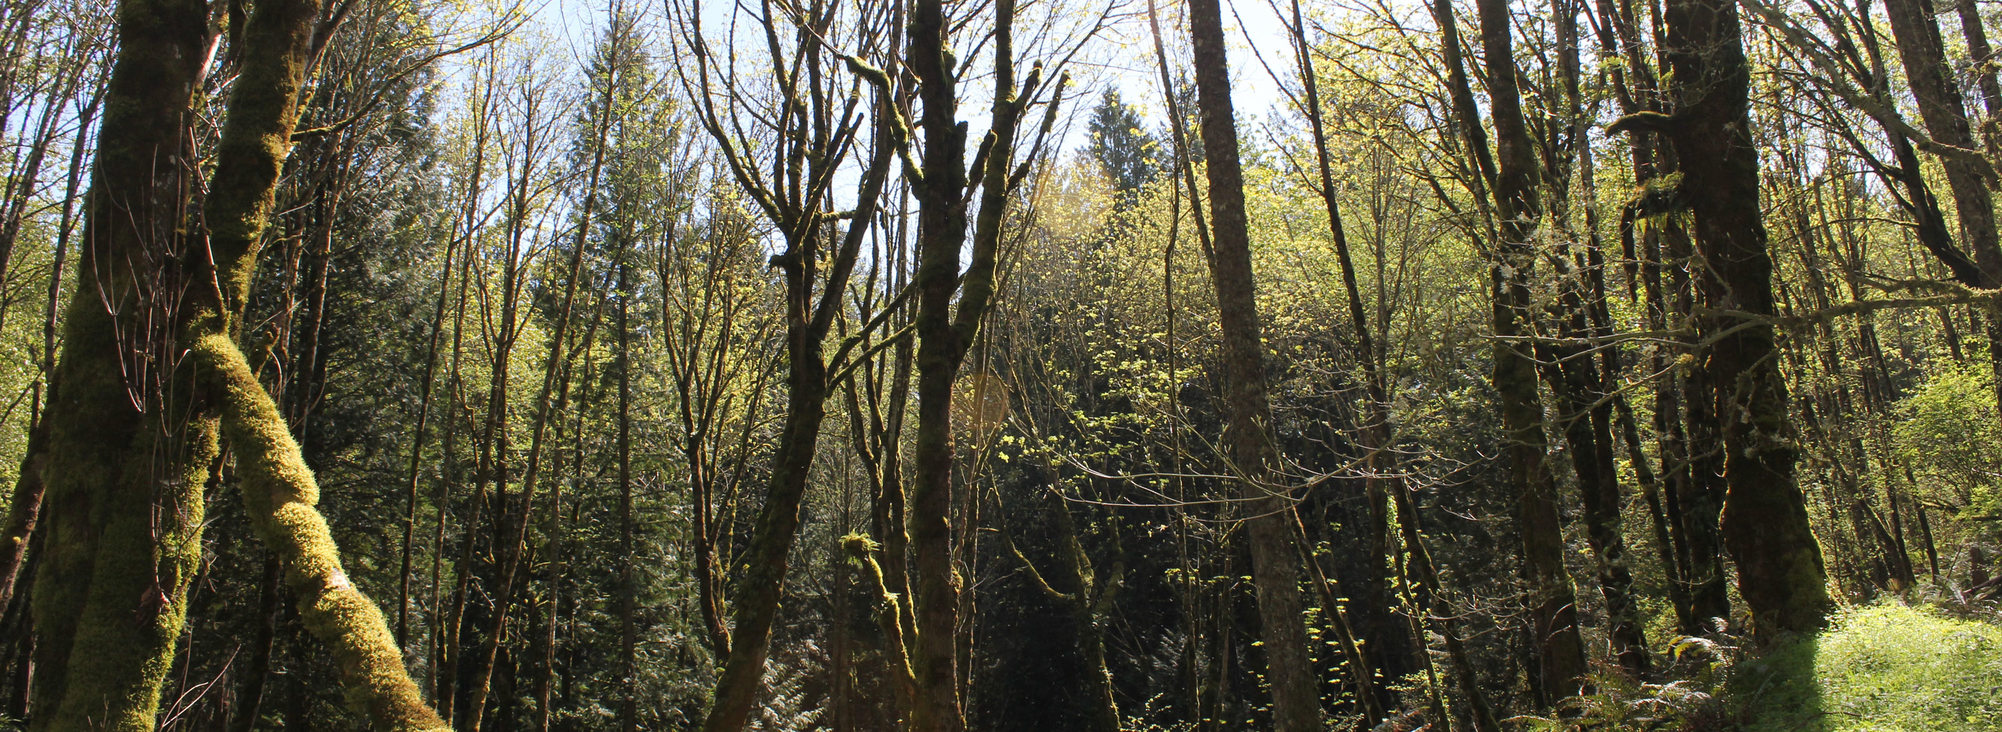 photo of trees at Gabbert Butte